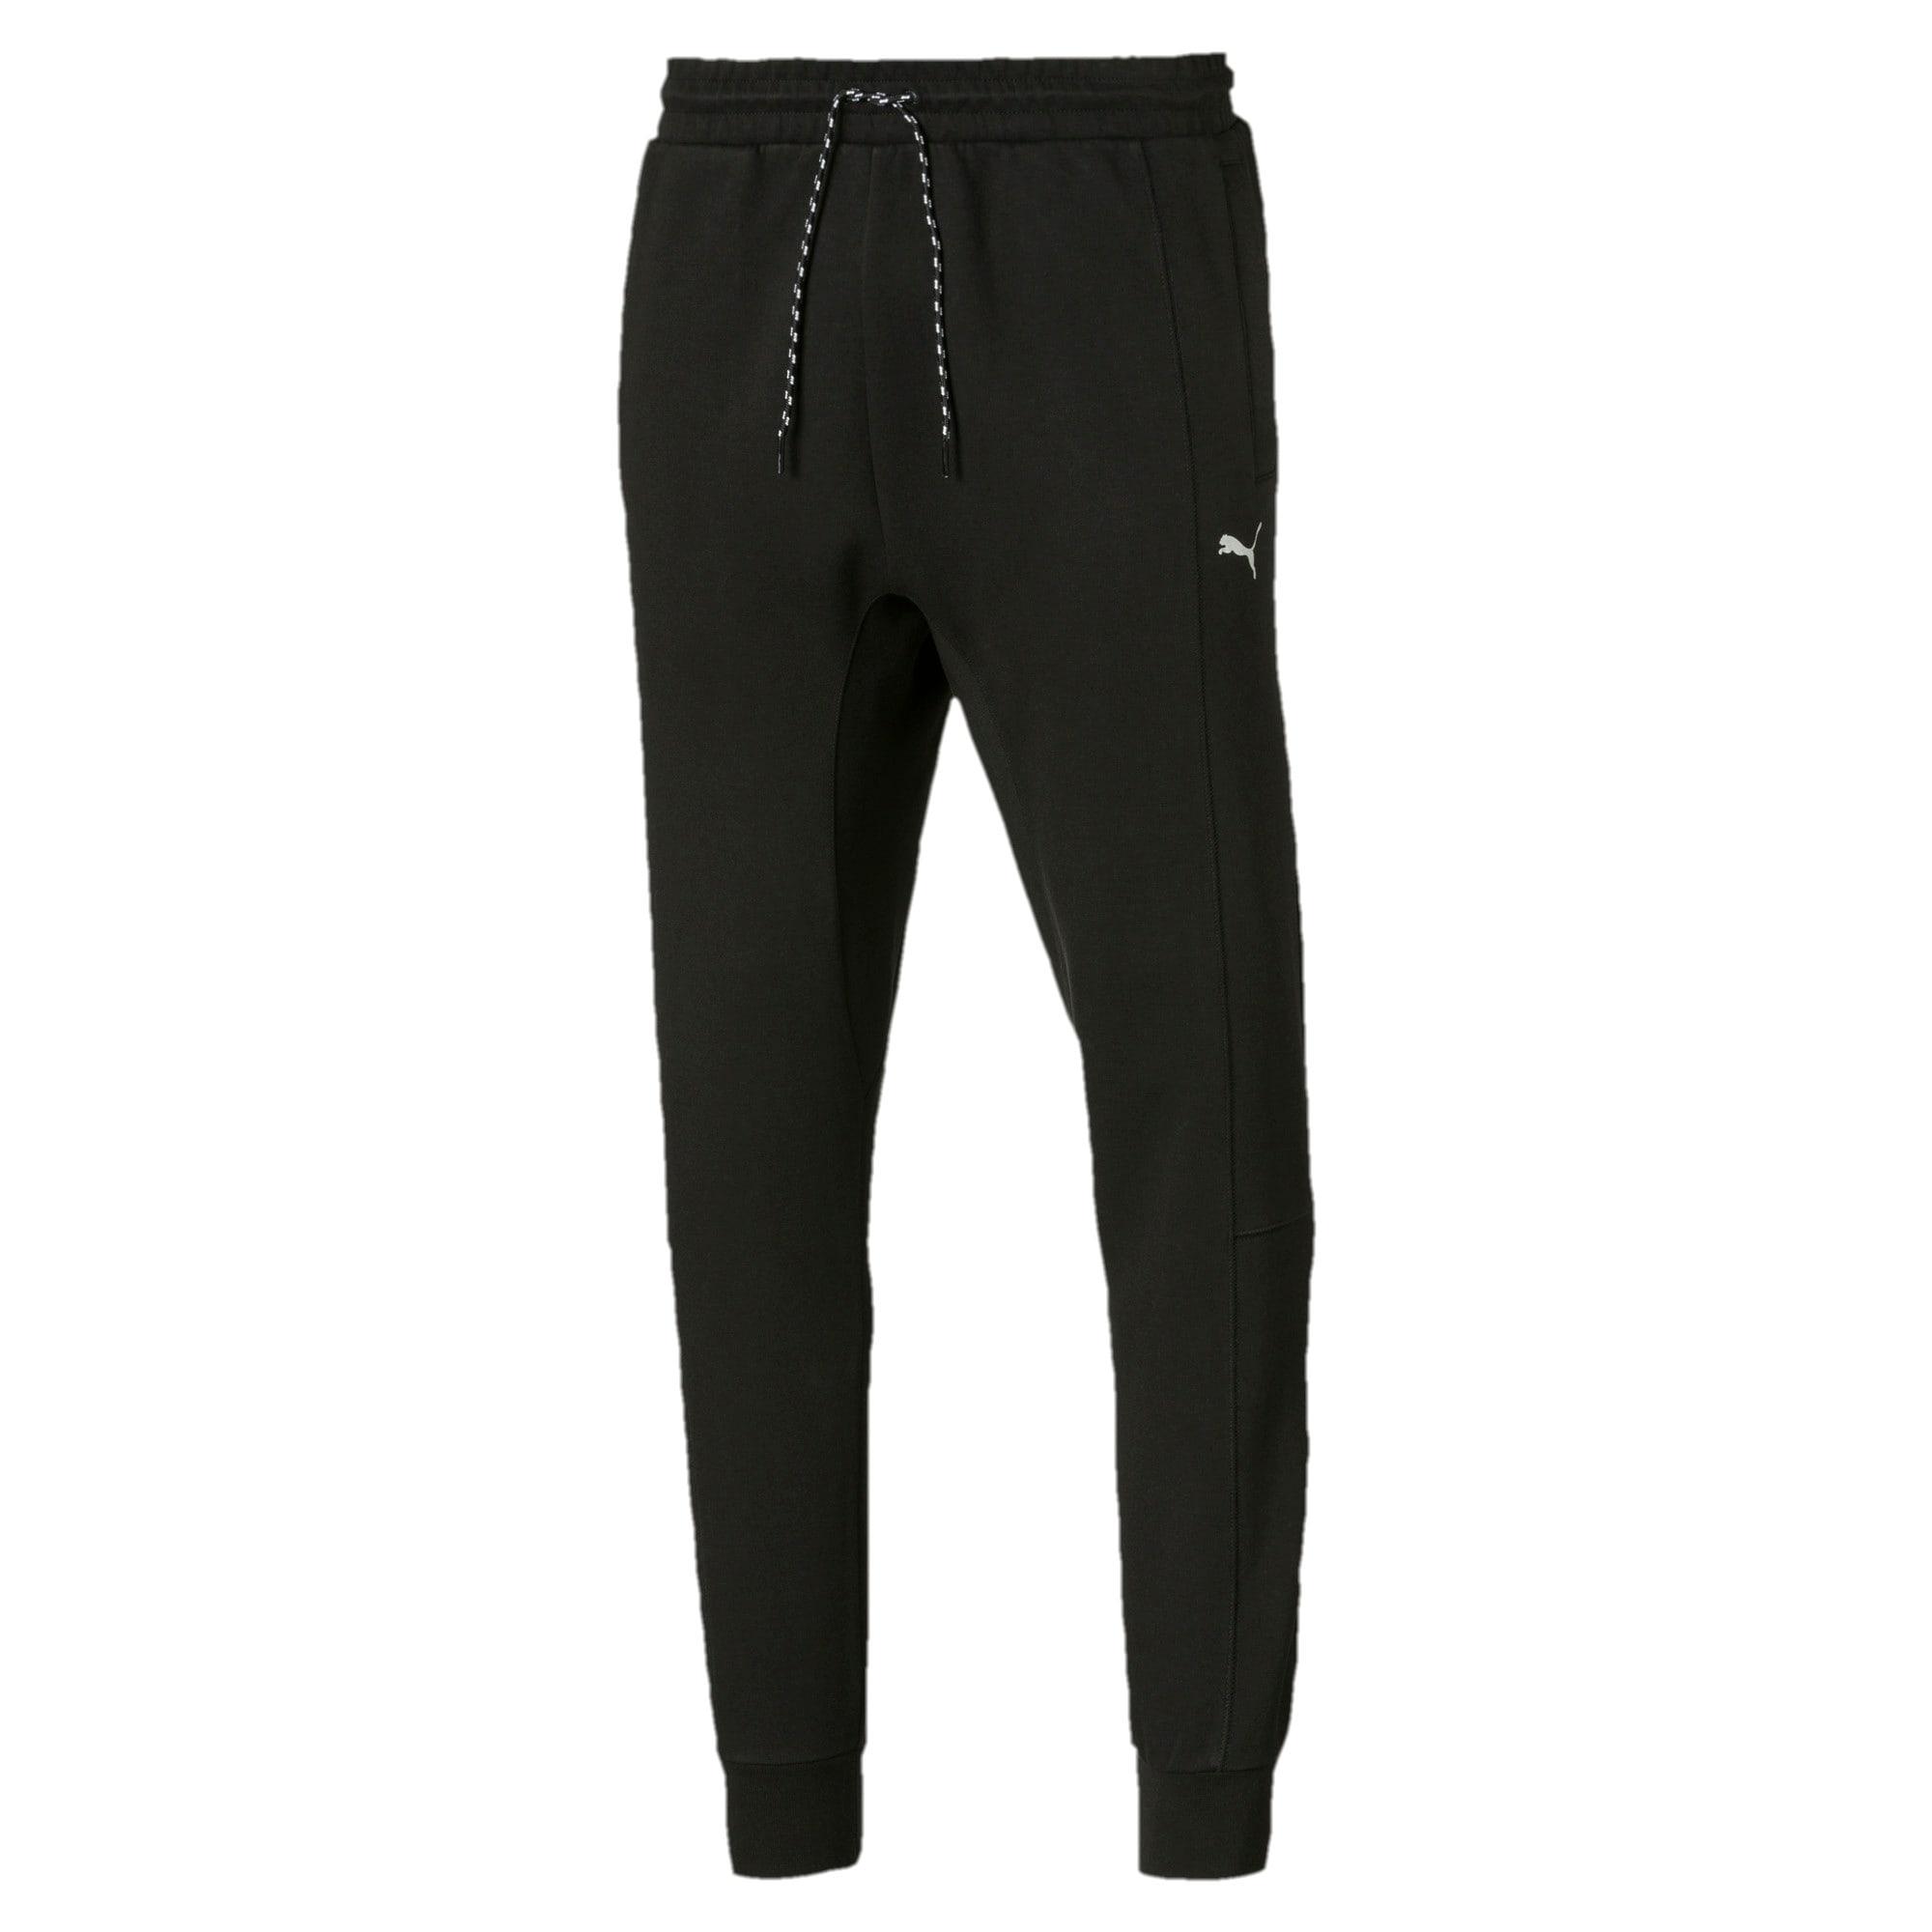 Thumbnail 1 of Epoch Knitted broek voor heren, Puma Black, medium